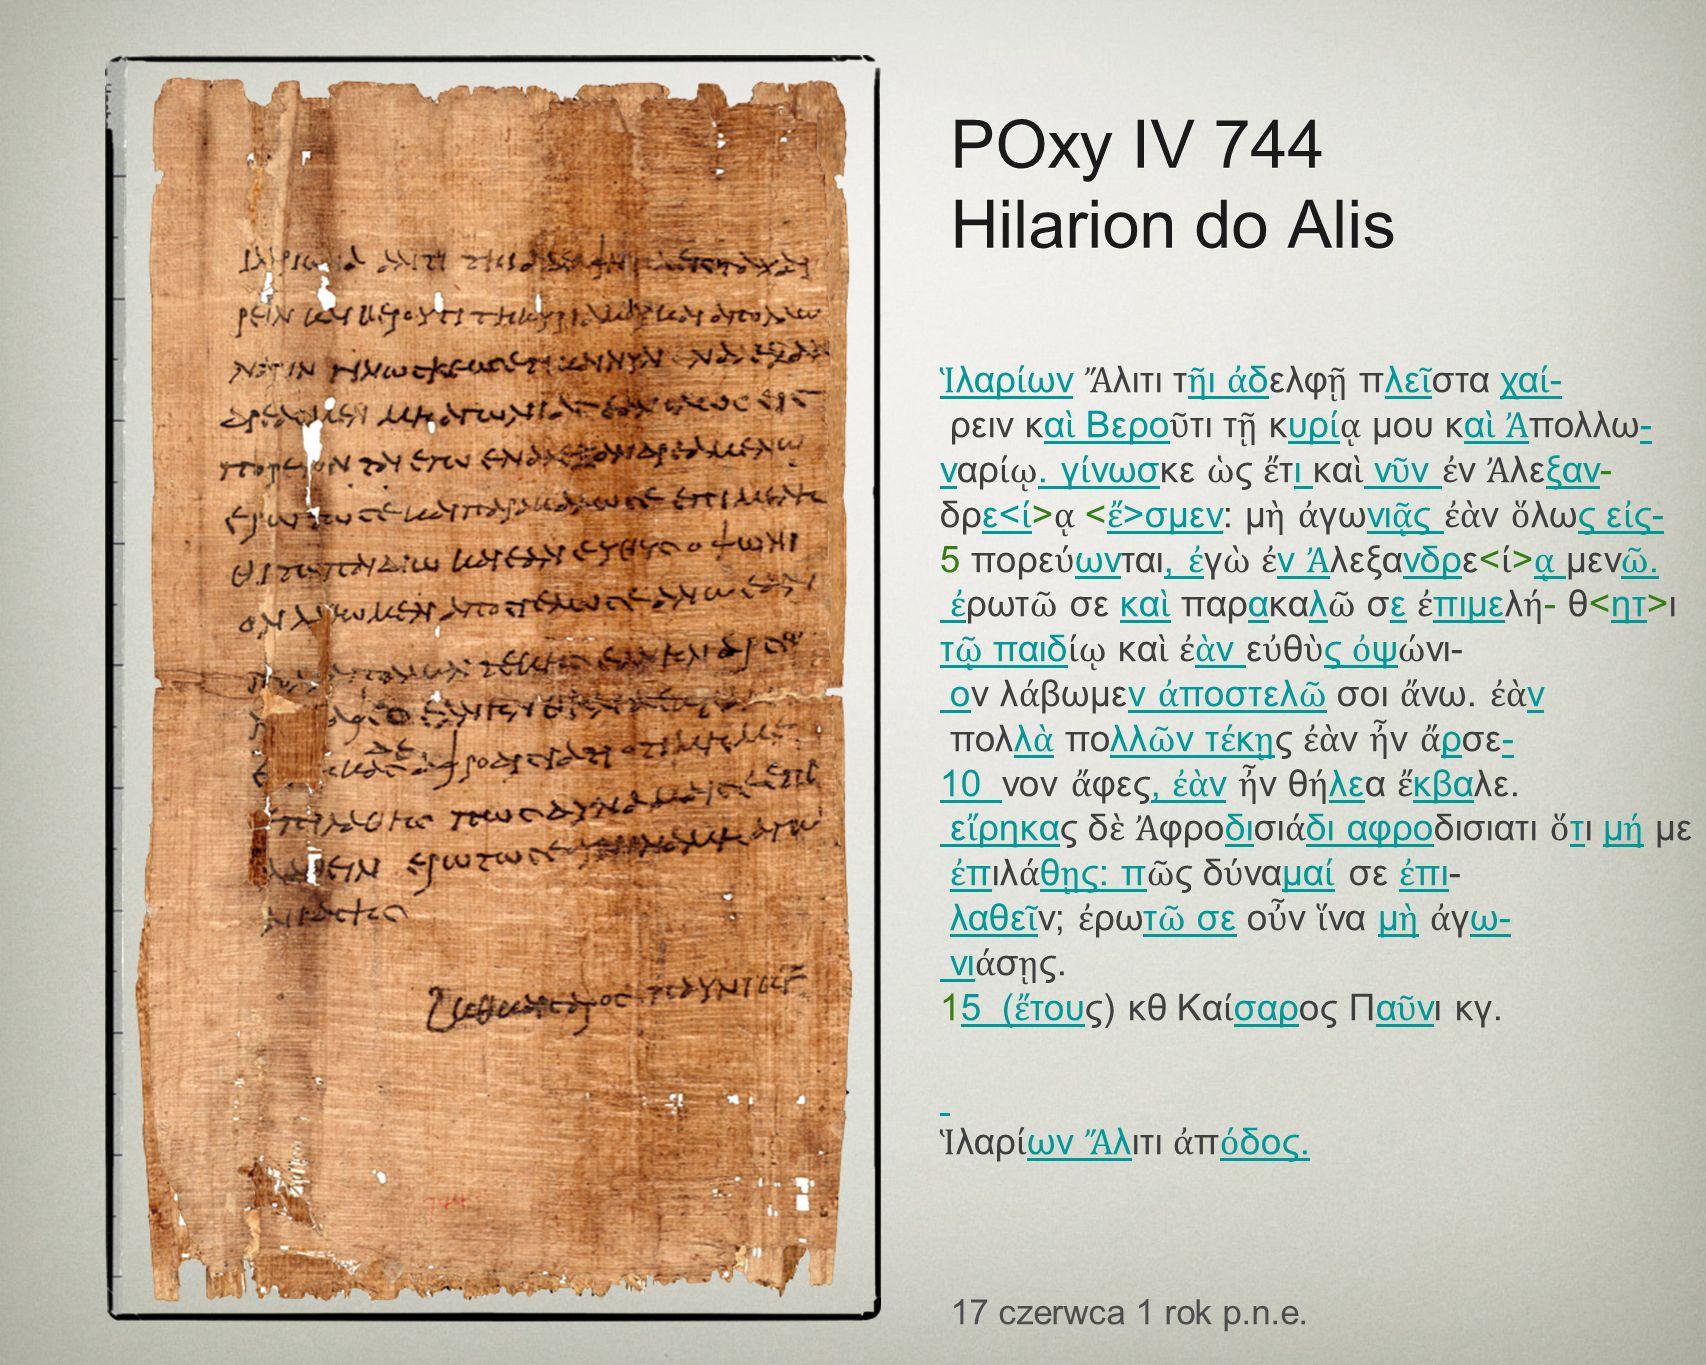 POxy IV 744 Hilarion do Alis 17 czerwca 1 rok p.n.e.